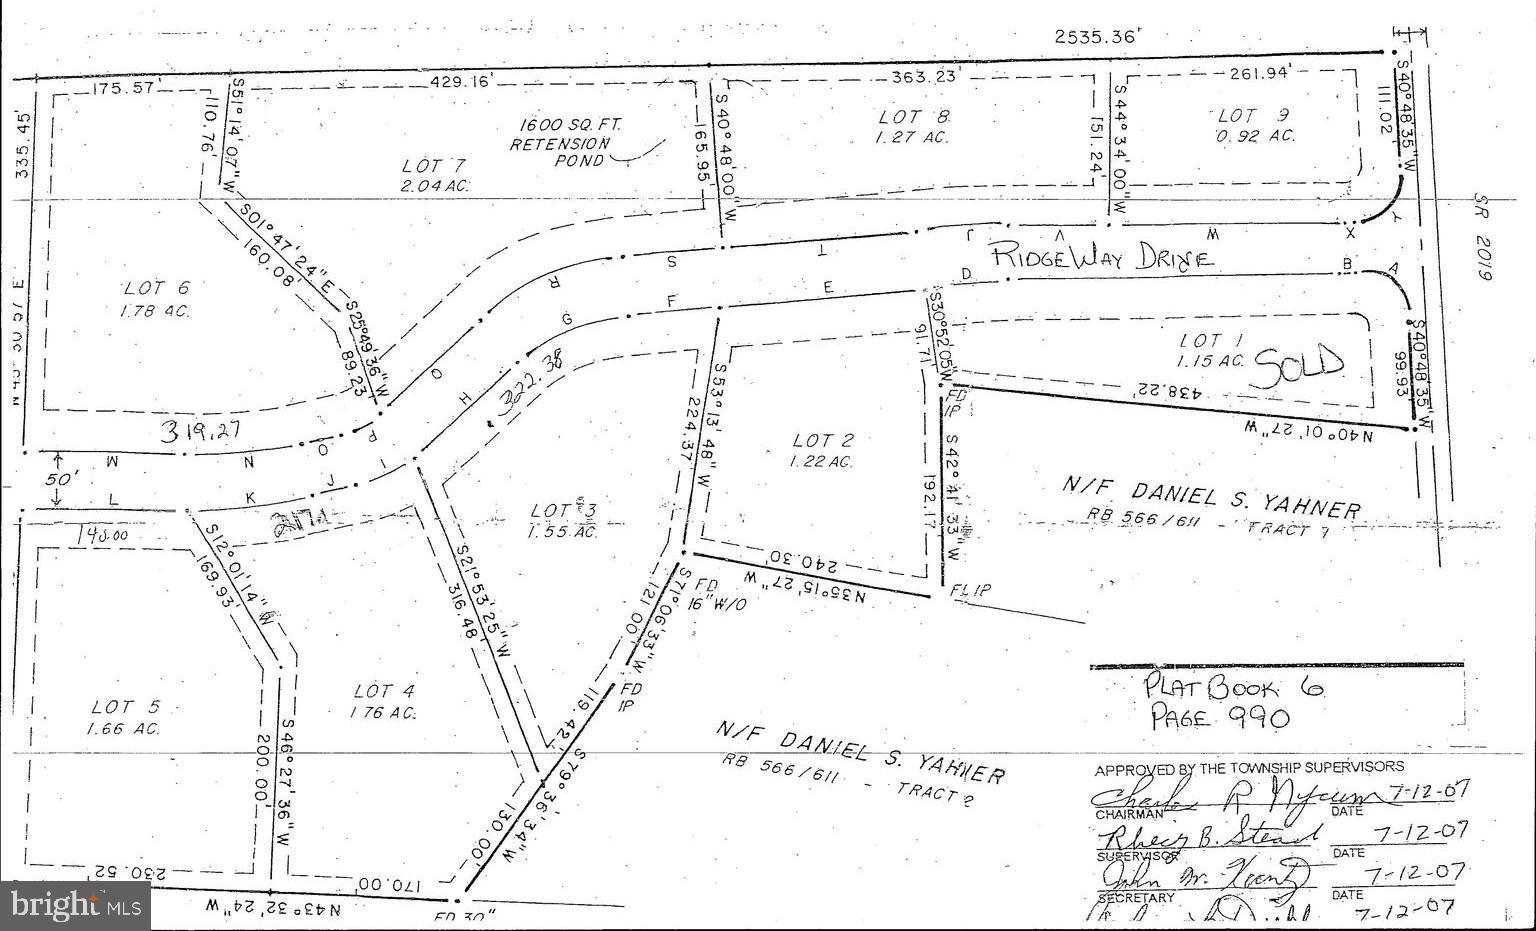 Lot #2 RIDGE WAY DRIVE, EVERETT, PA 15537